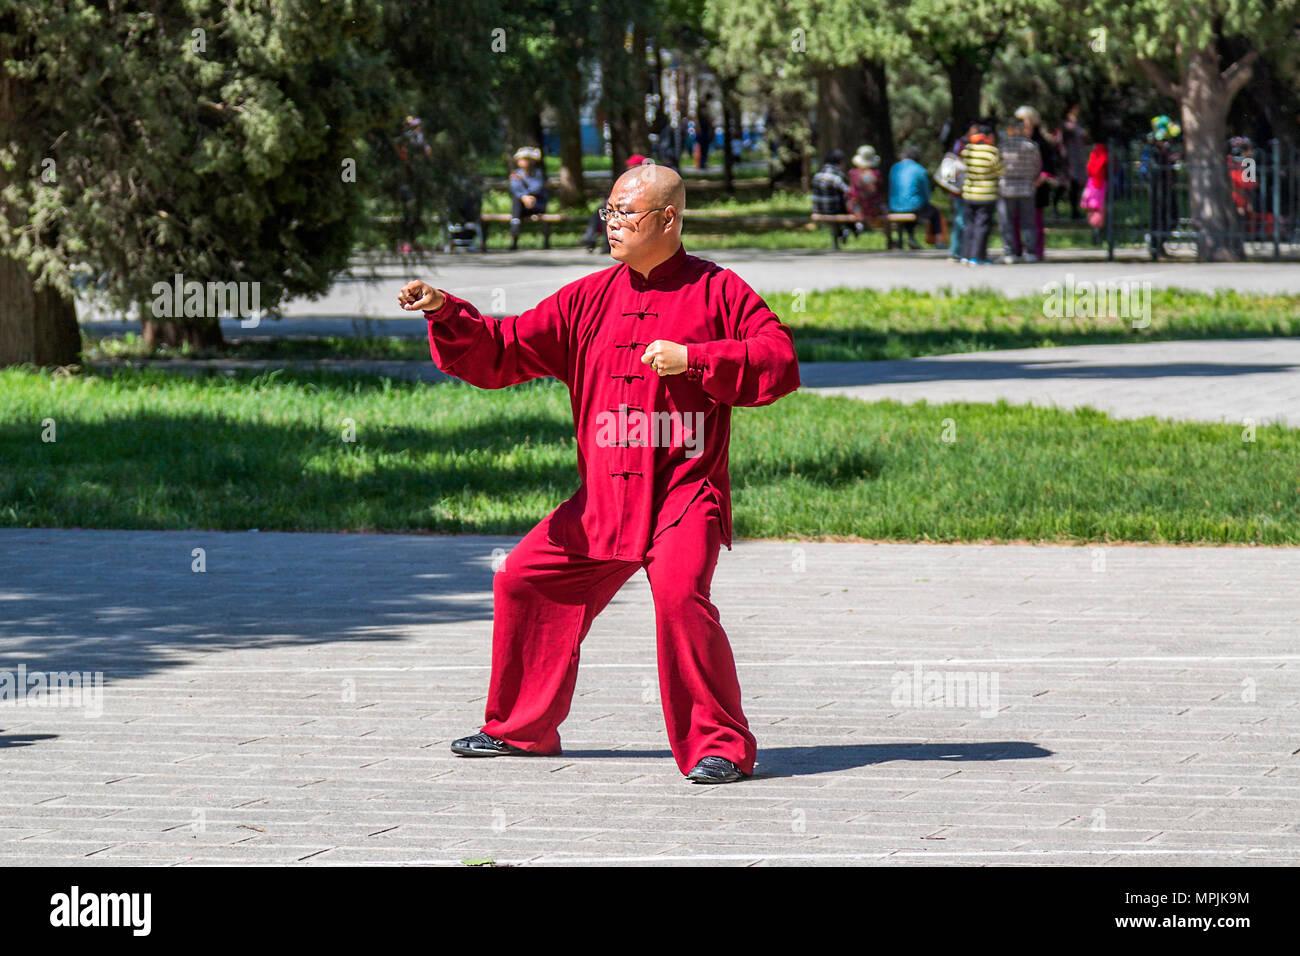 Martial Artist Stock Photos & Martial Artist Stock Images - Alamy